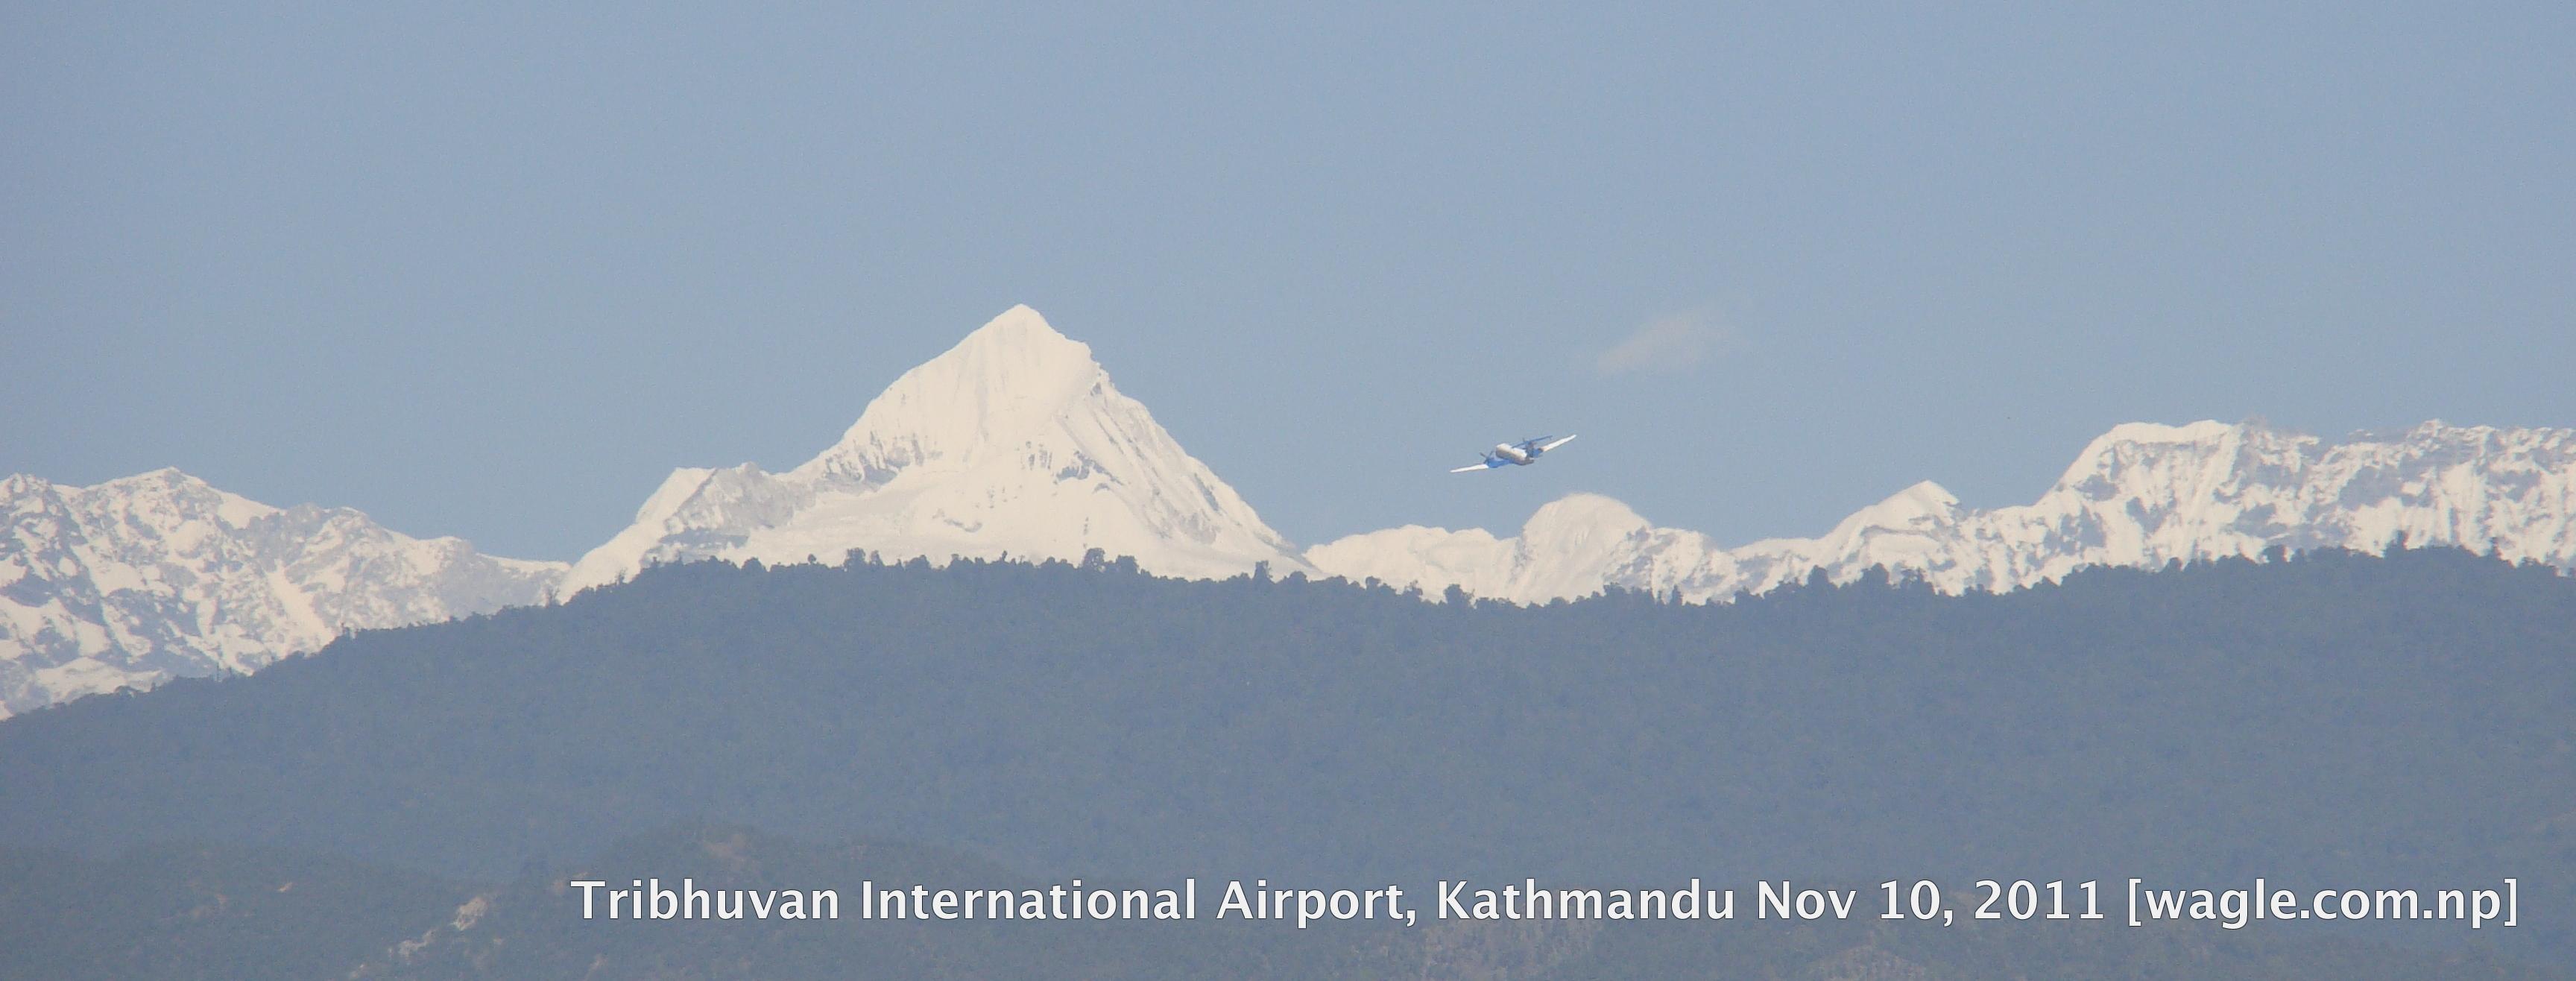 tribhuvan international airport kathmandu nepal